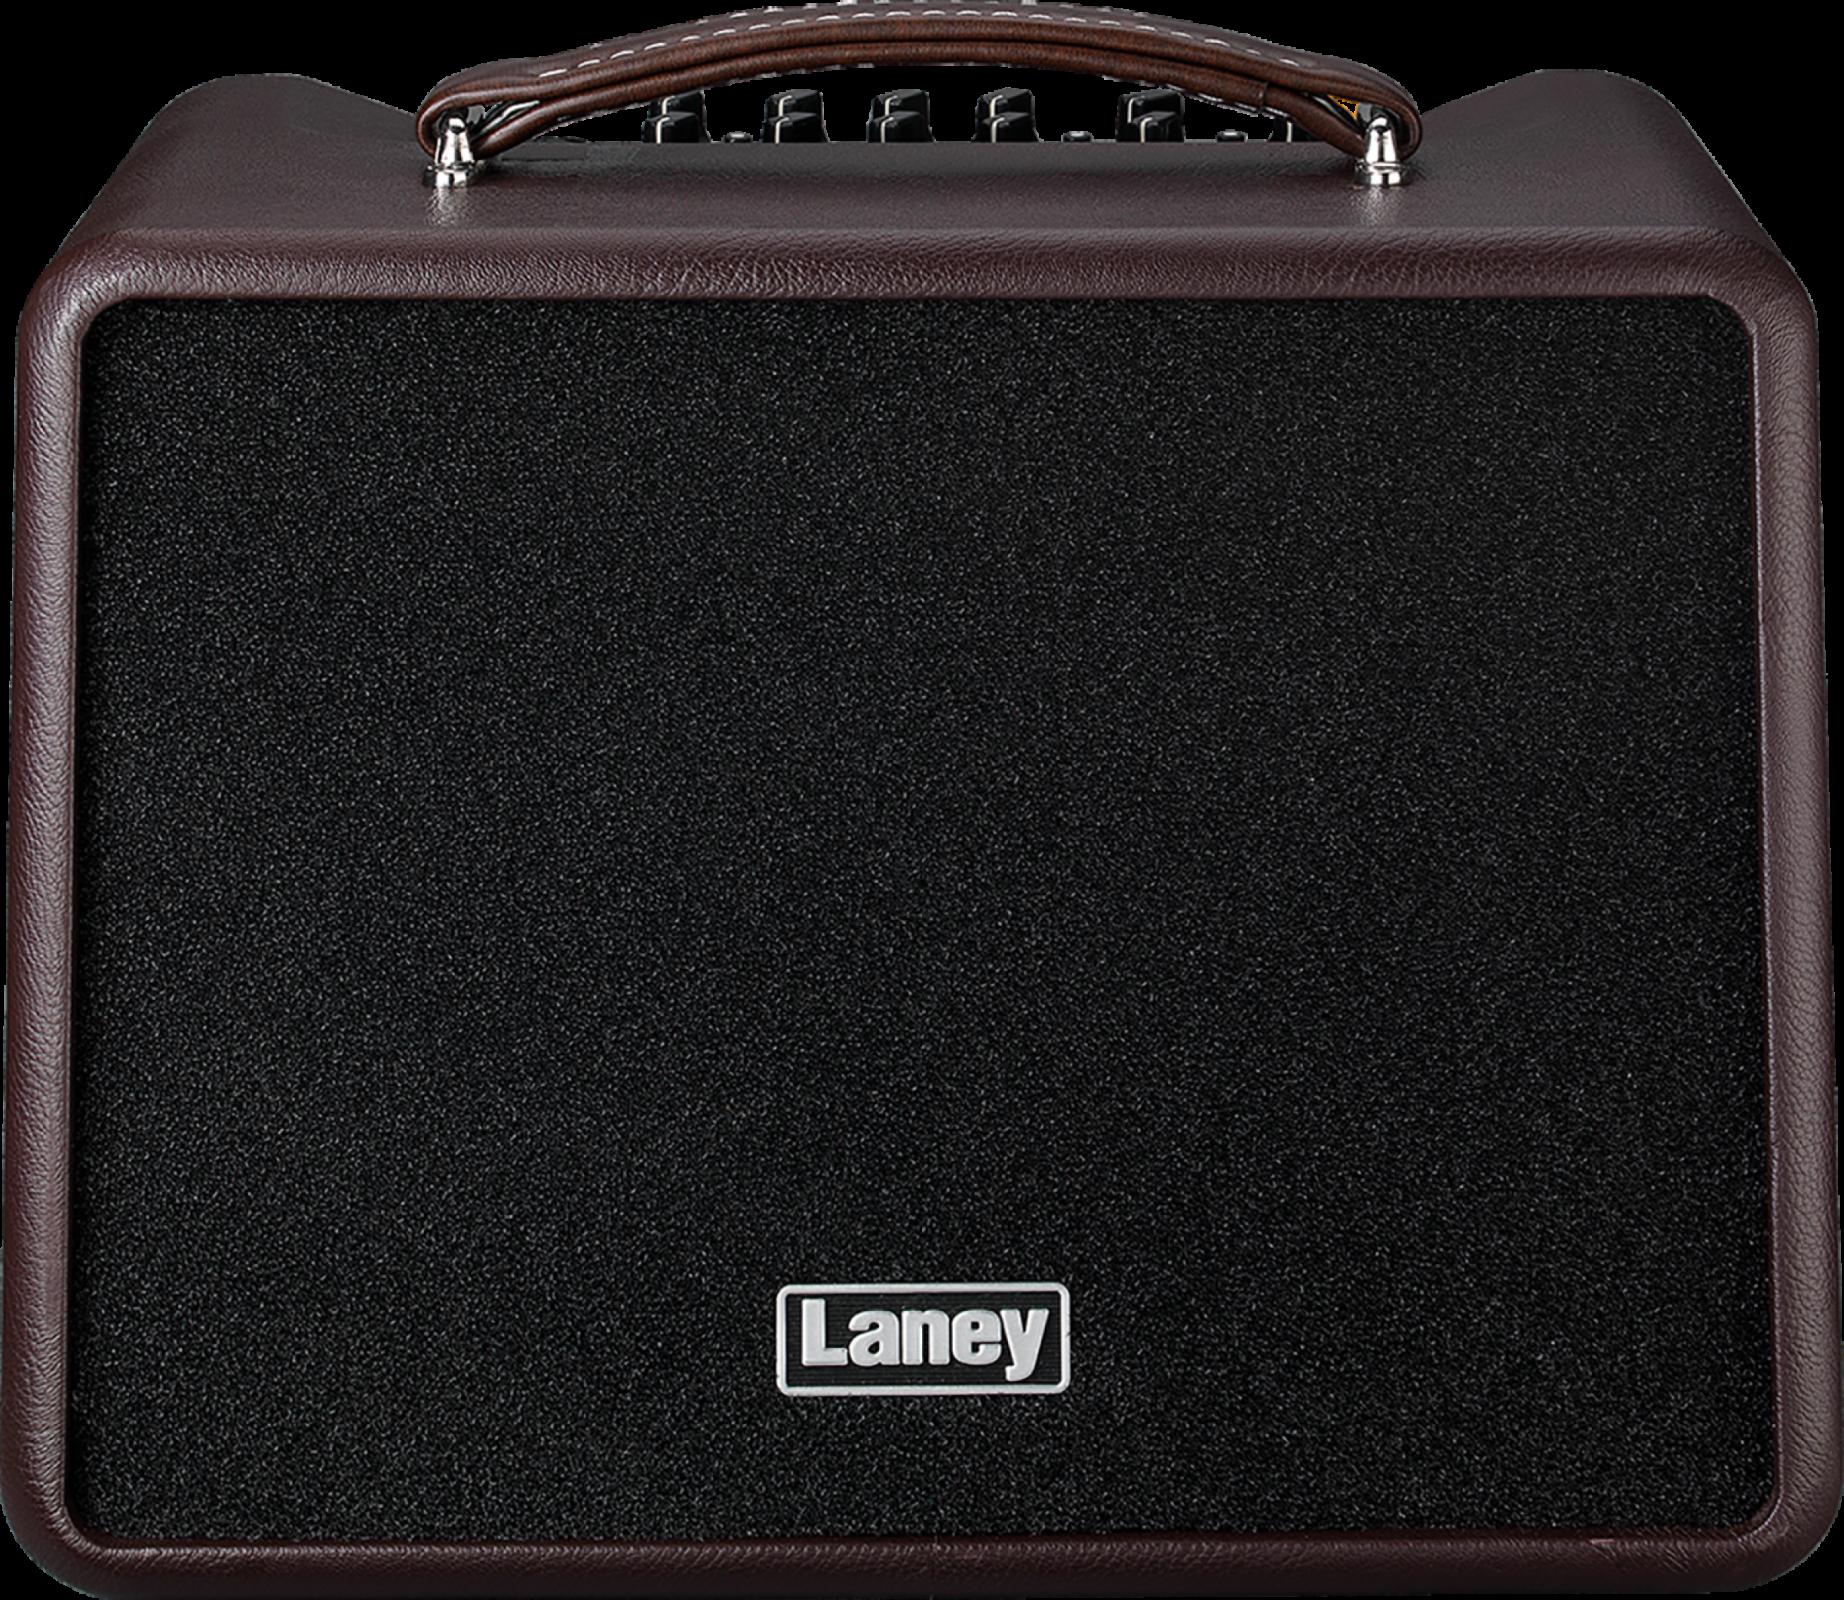 LANEY A-SOLO ACOUSTIC GUITAR AMPLIFIER 1x8 2 CHANNEL 60 WATTS W/DFX